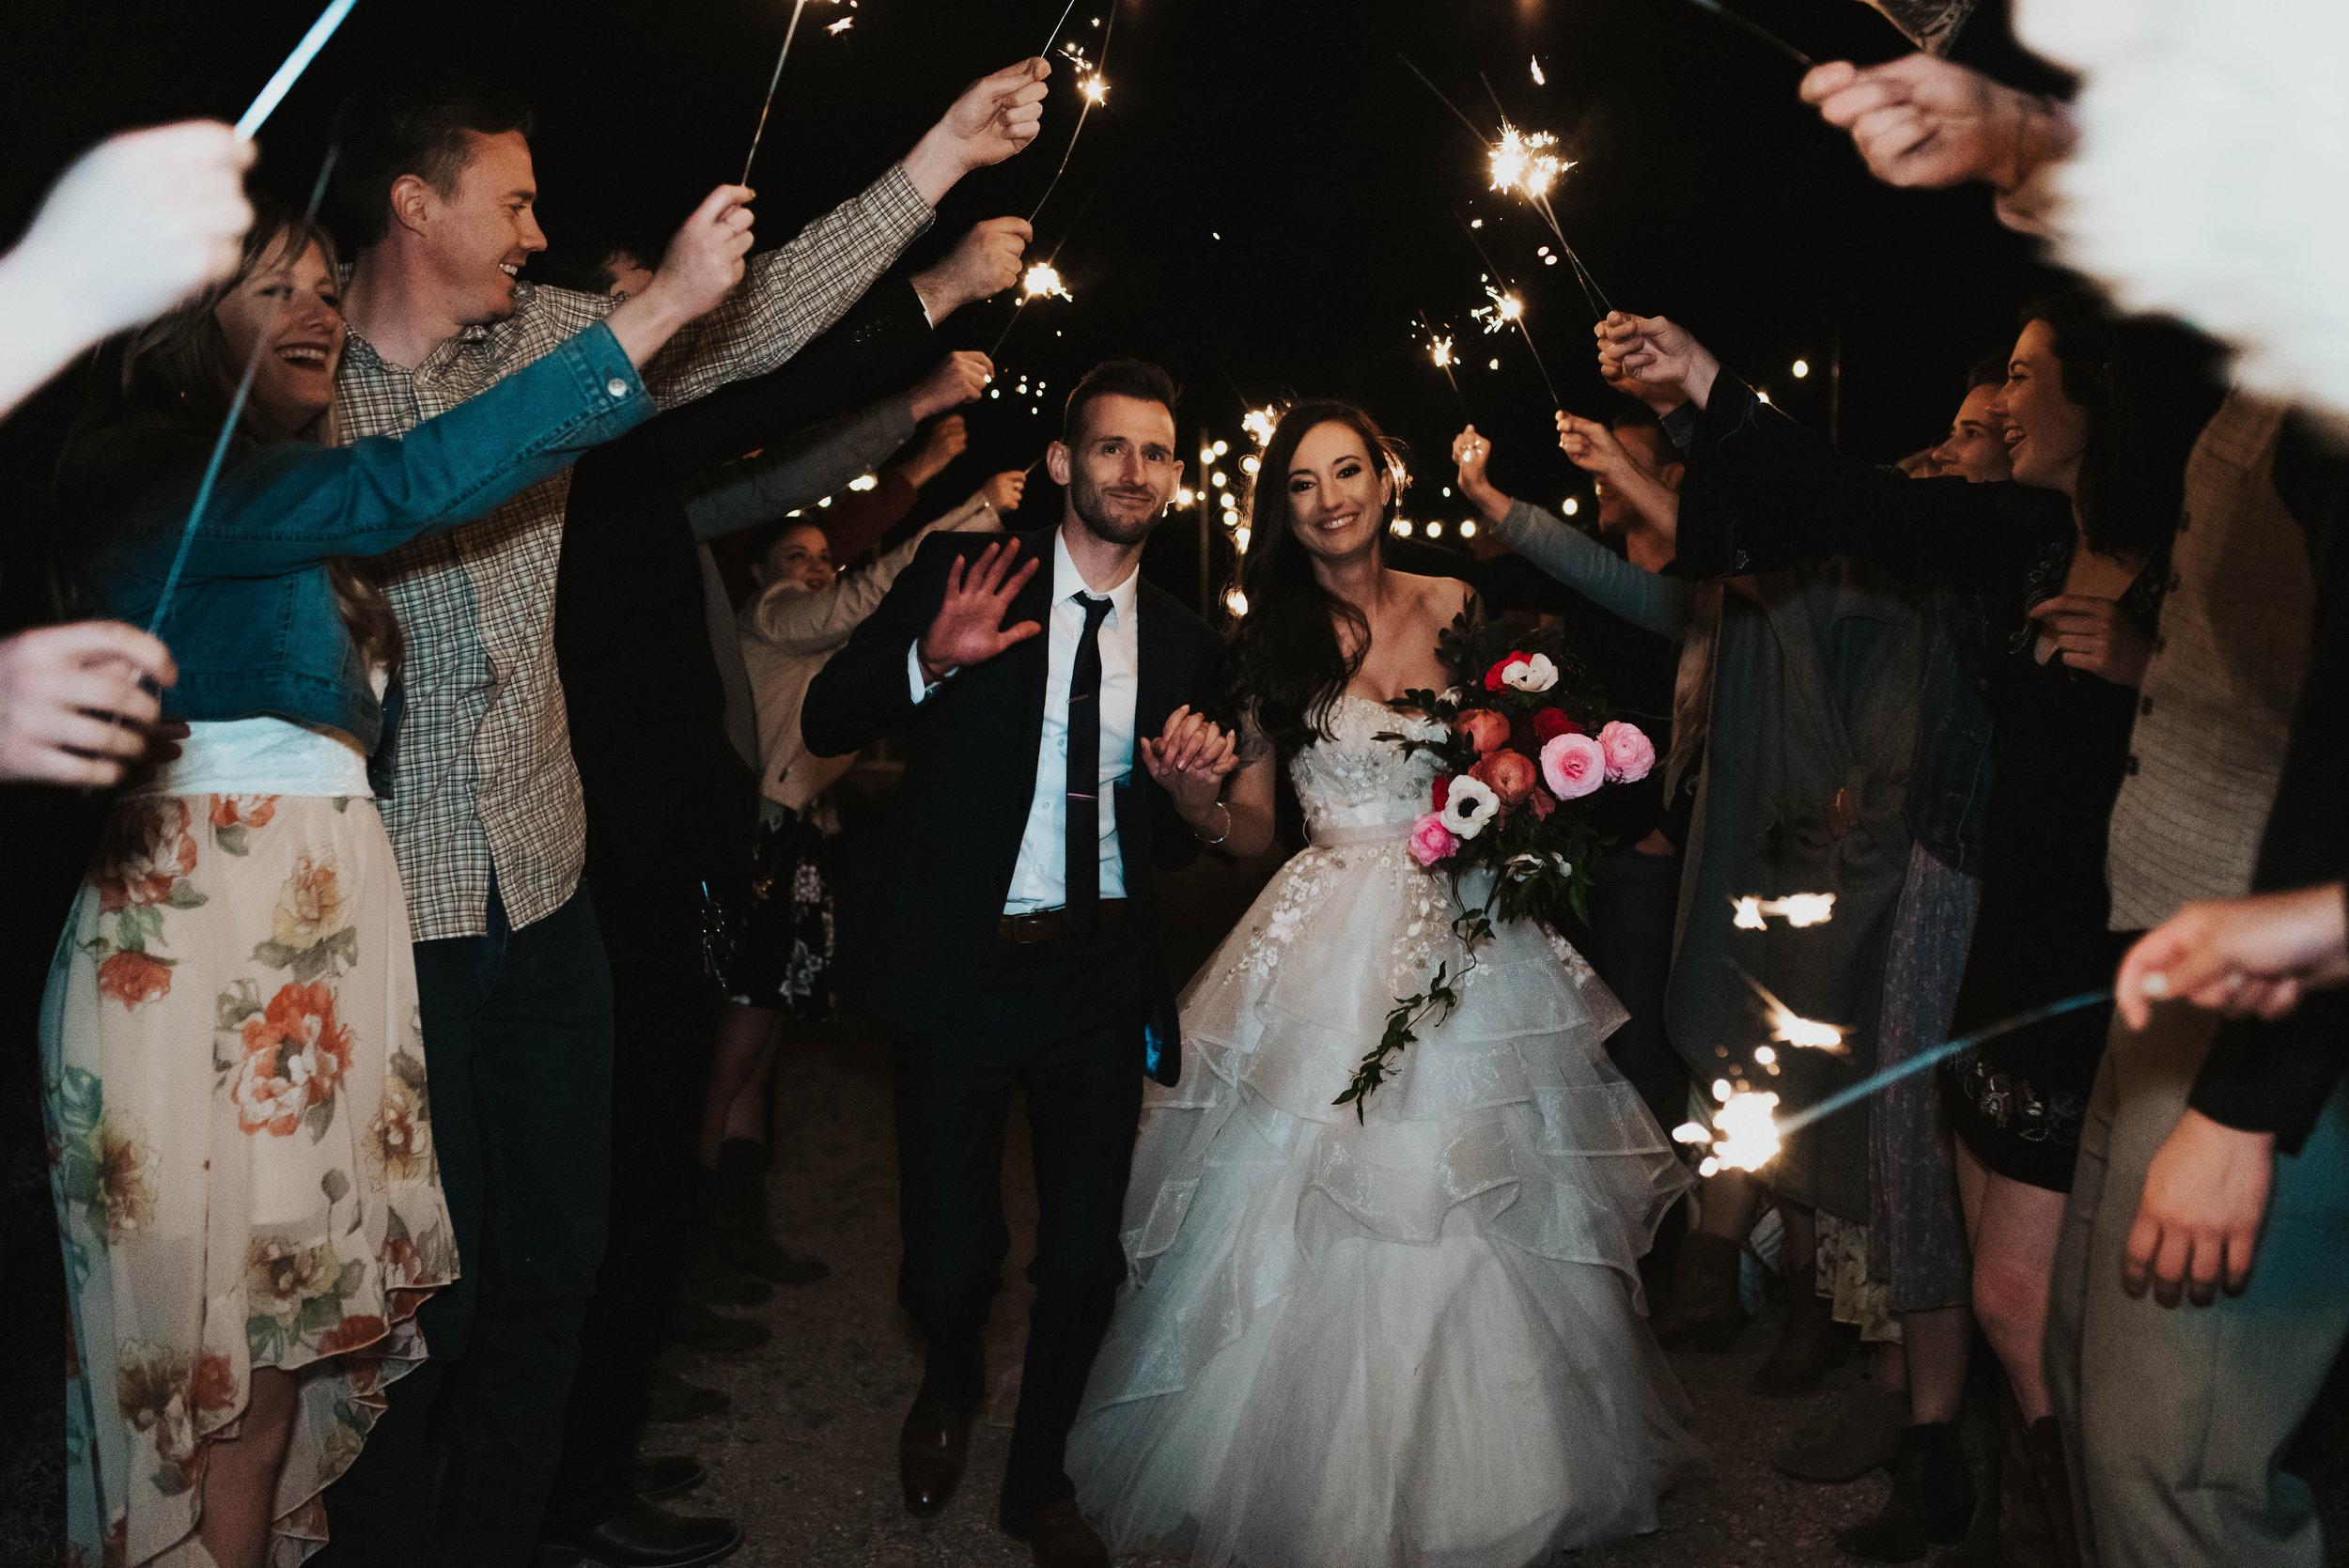 Desert Wedding at Tela Peralta - Arizona florist Phoenix scottsdale Mesa chandler Sedona Flagstaff Prescott - Sparkler Exit